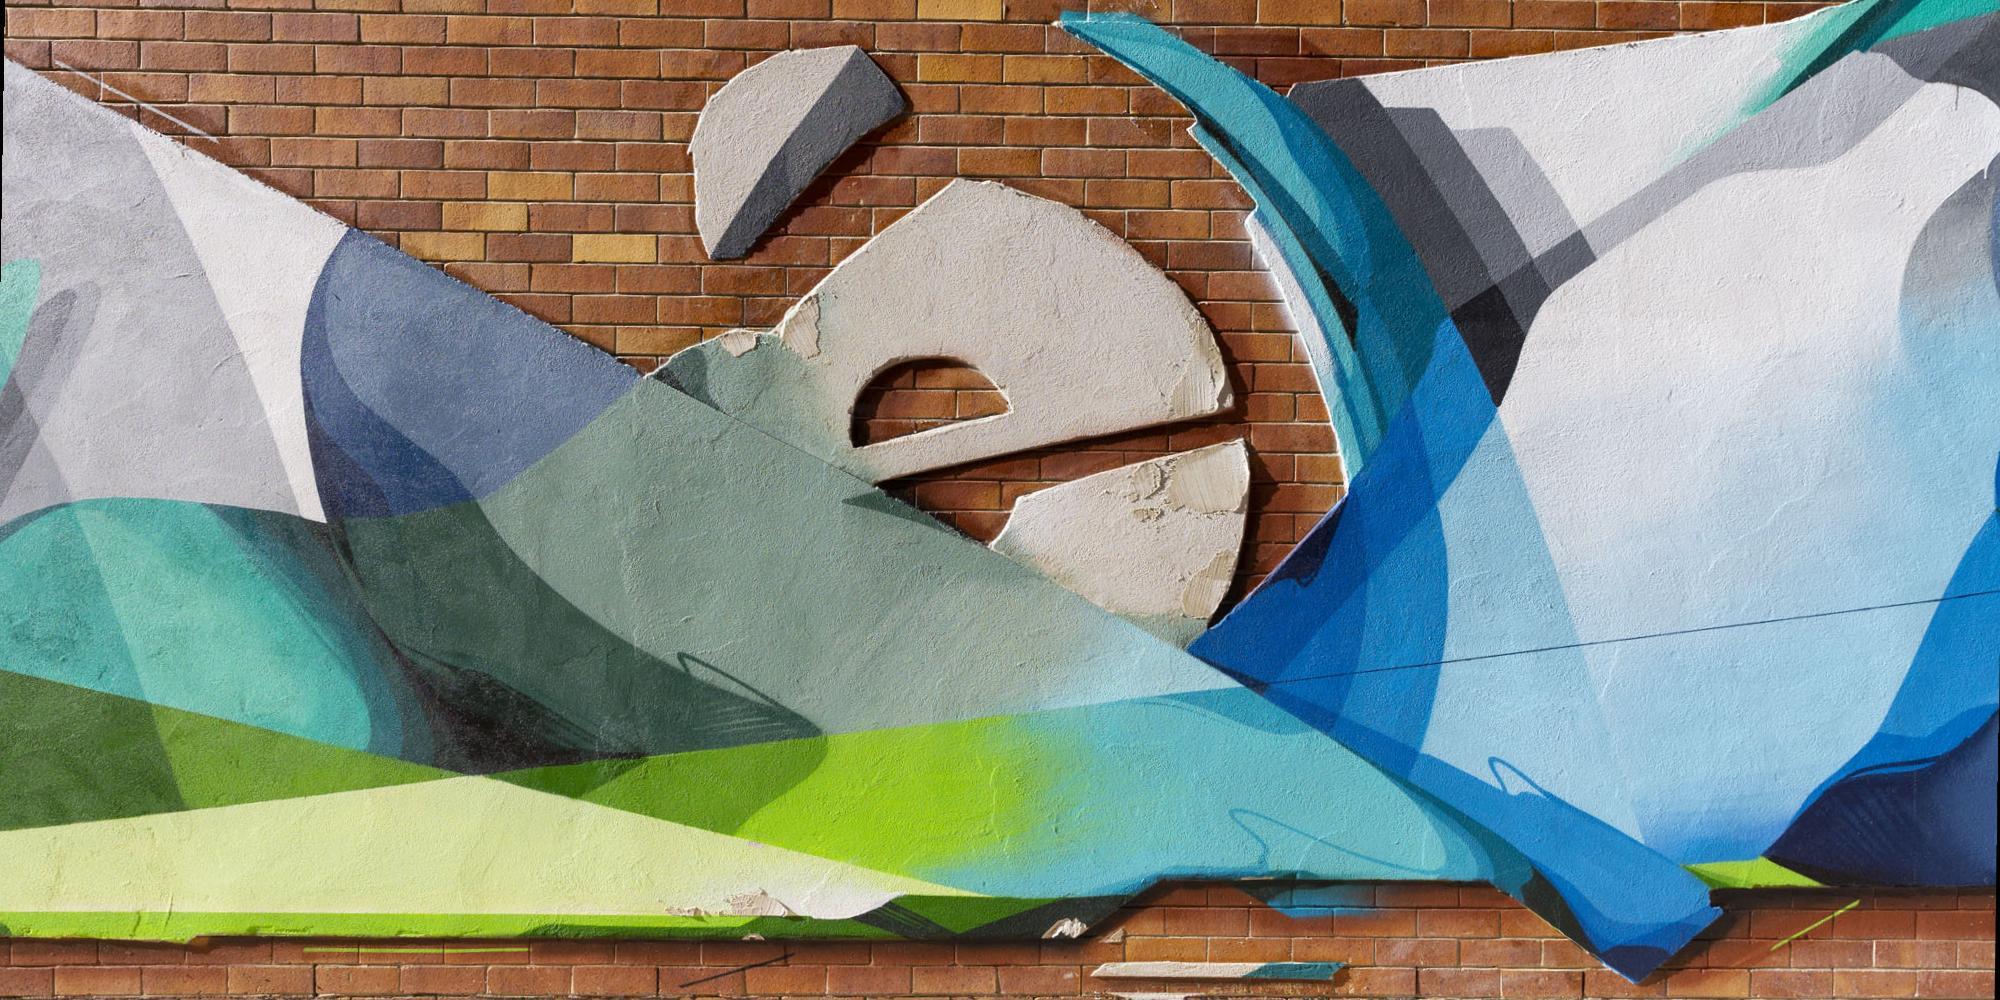 A work by Does - Brisbane, Australia_thumb